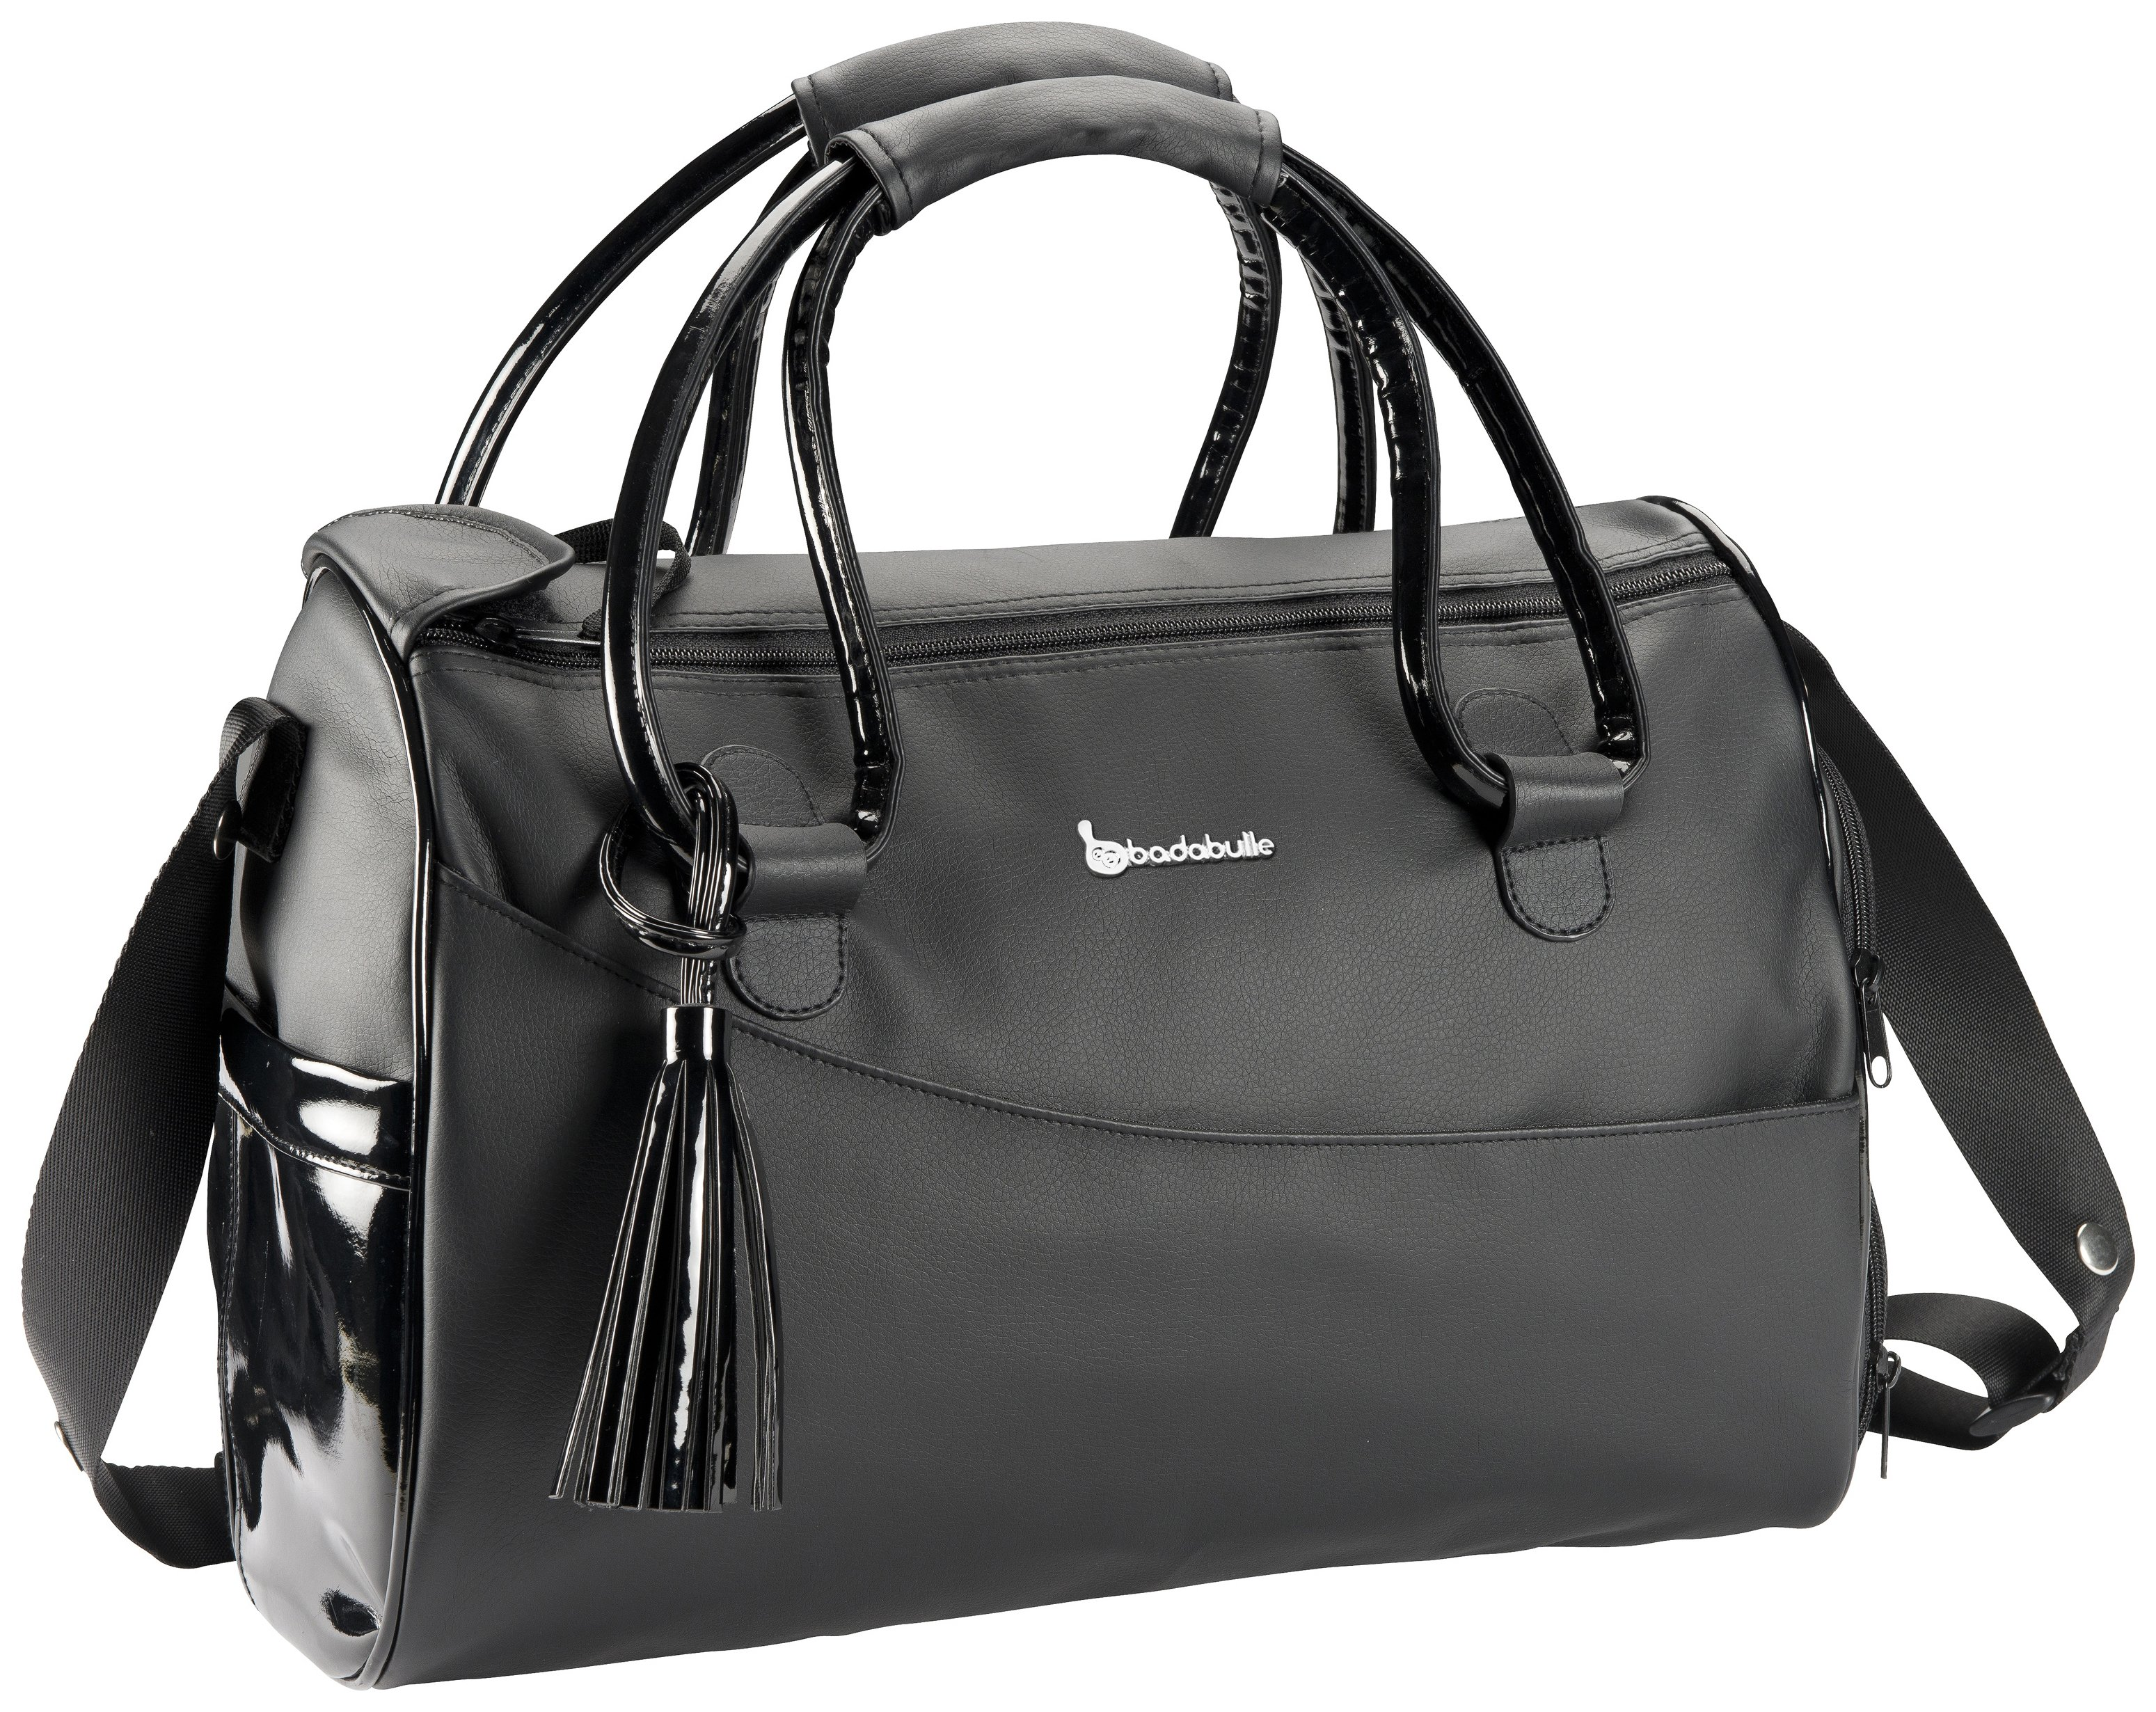 Badabulle Changing Bag - Glossy